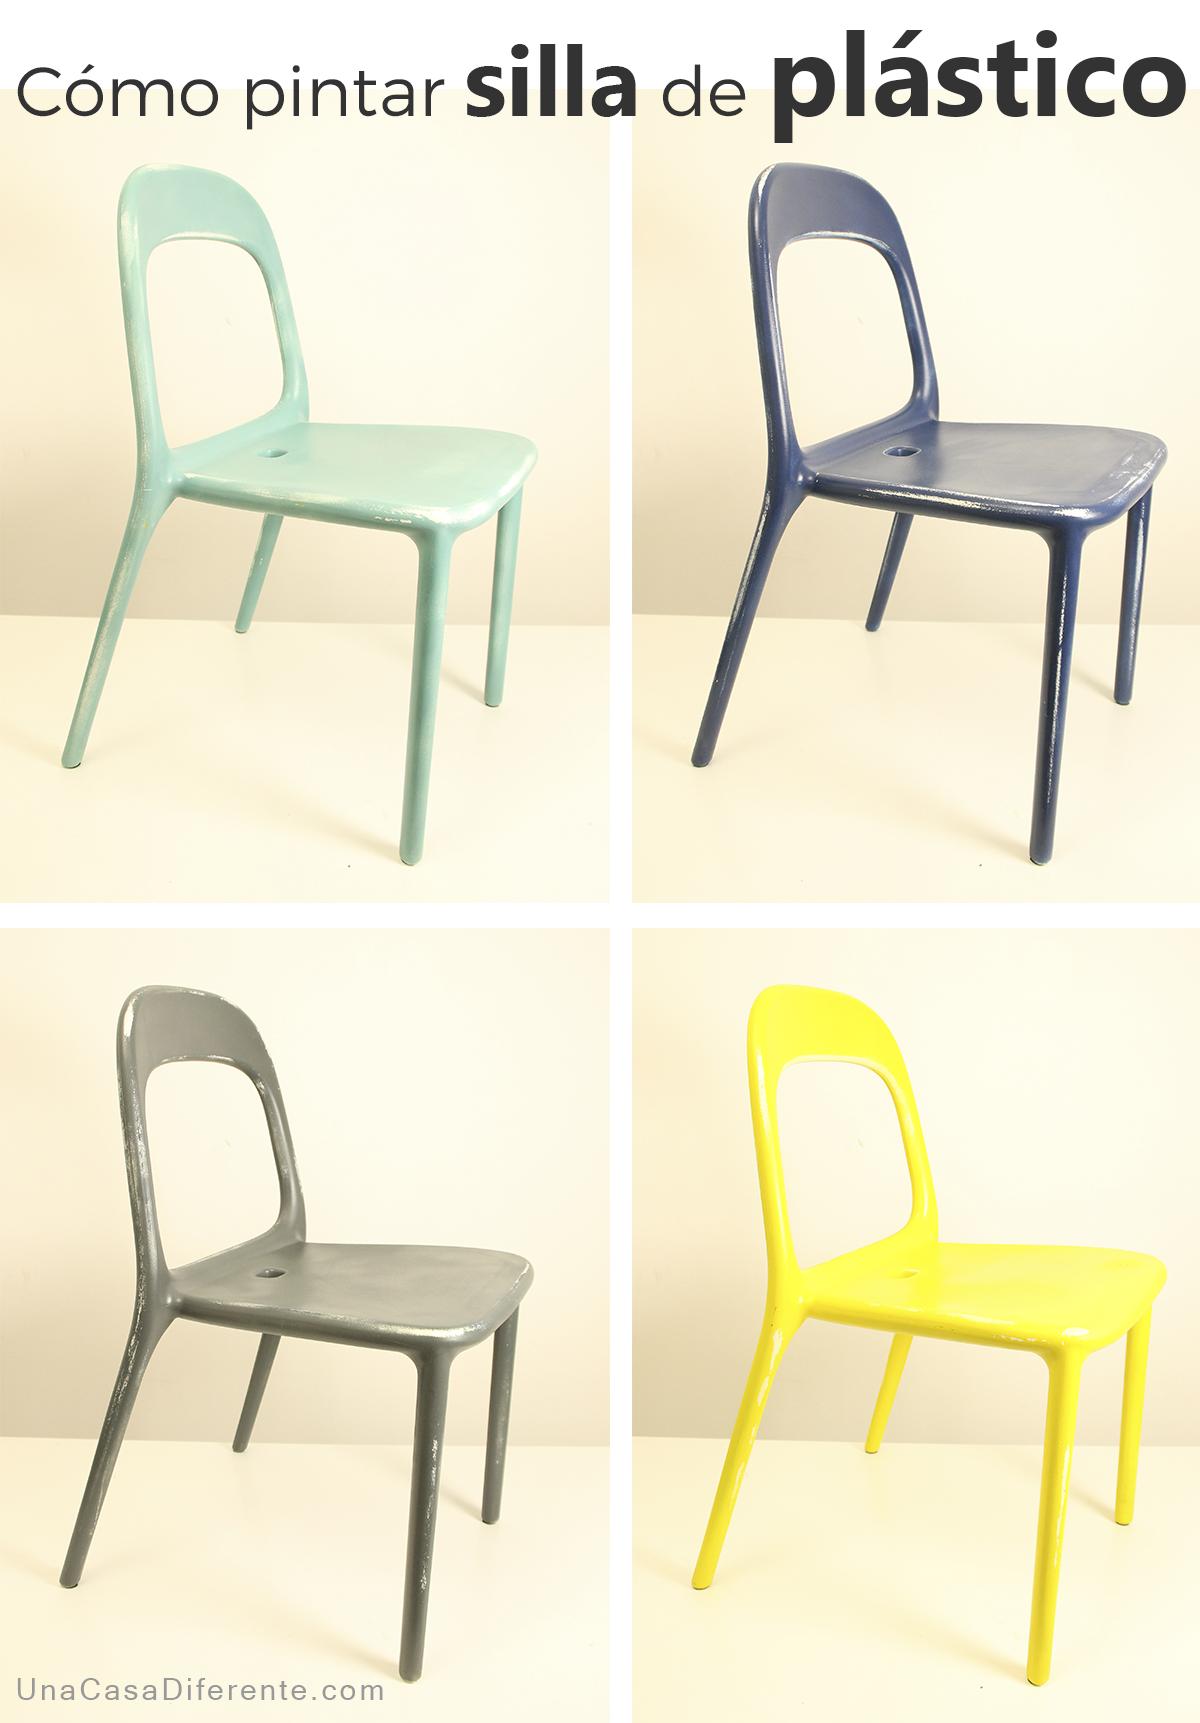 o pintar sillas de plastico ikea hacks Tips